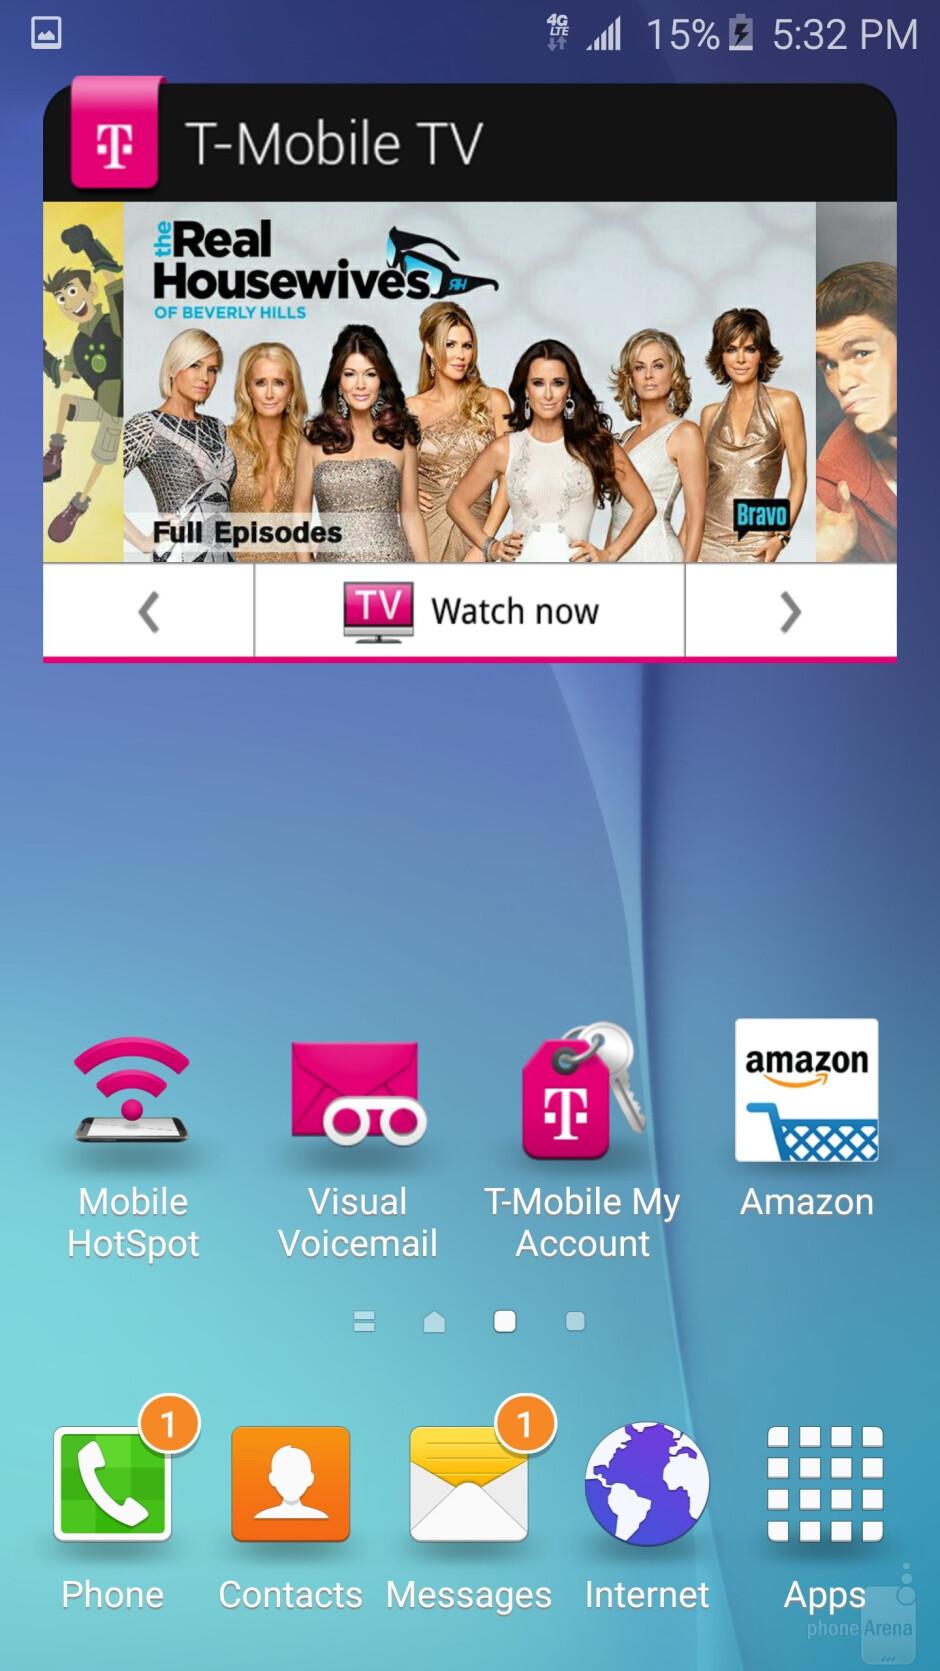 The TouchWiz UI on the Galaxy S6 edge - Samsung Galaxy S6 edge vs Apple iPhone 6